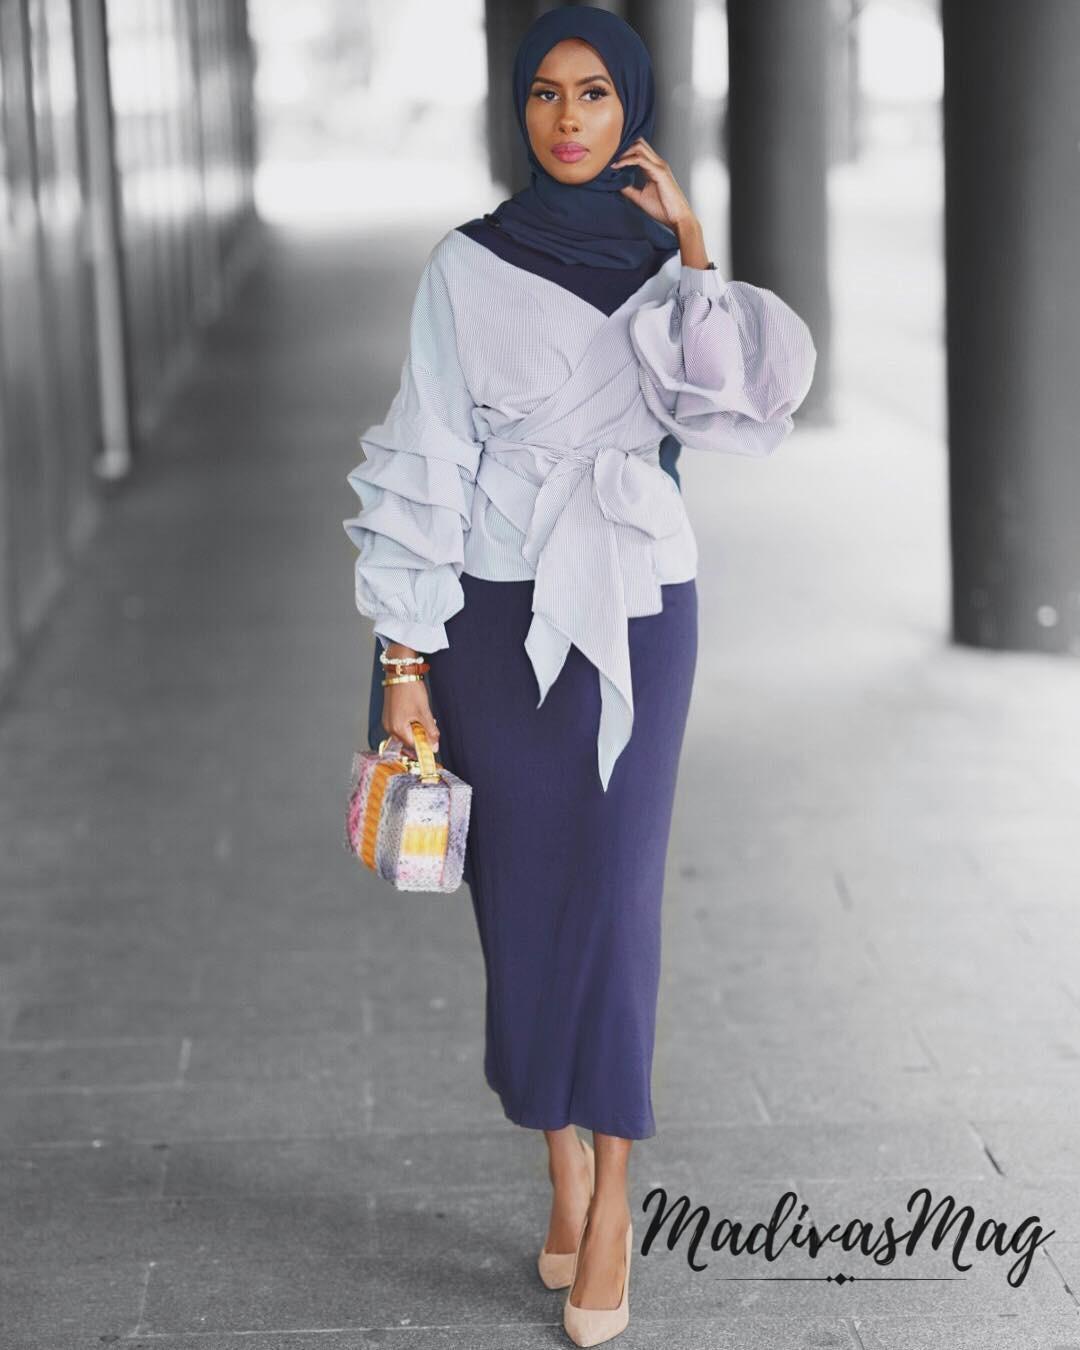 hijab fashion @basma_k OXAFNQU